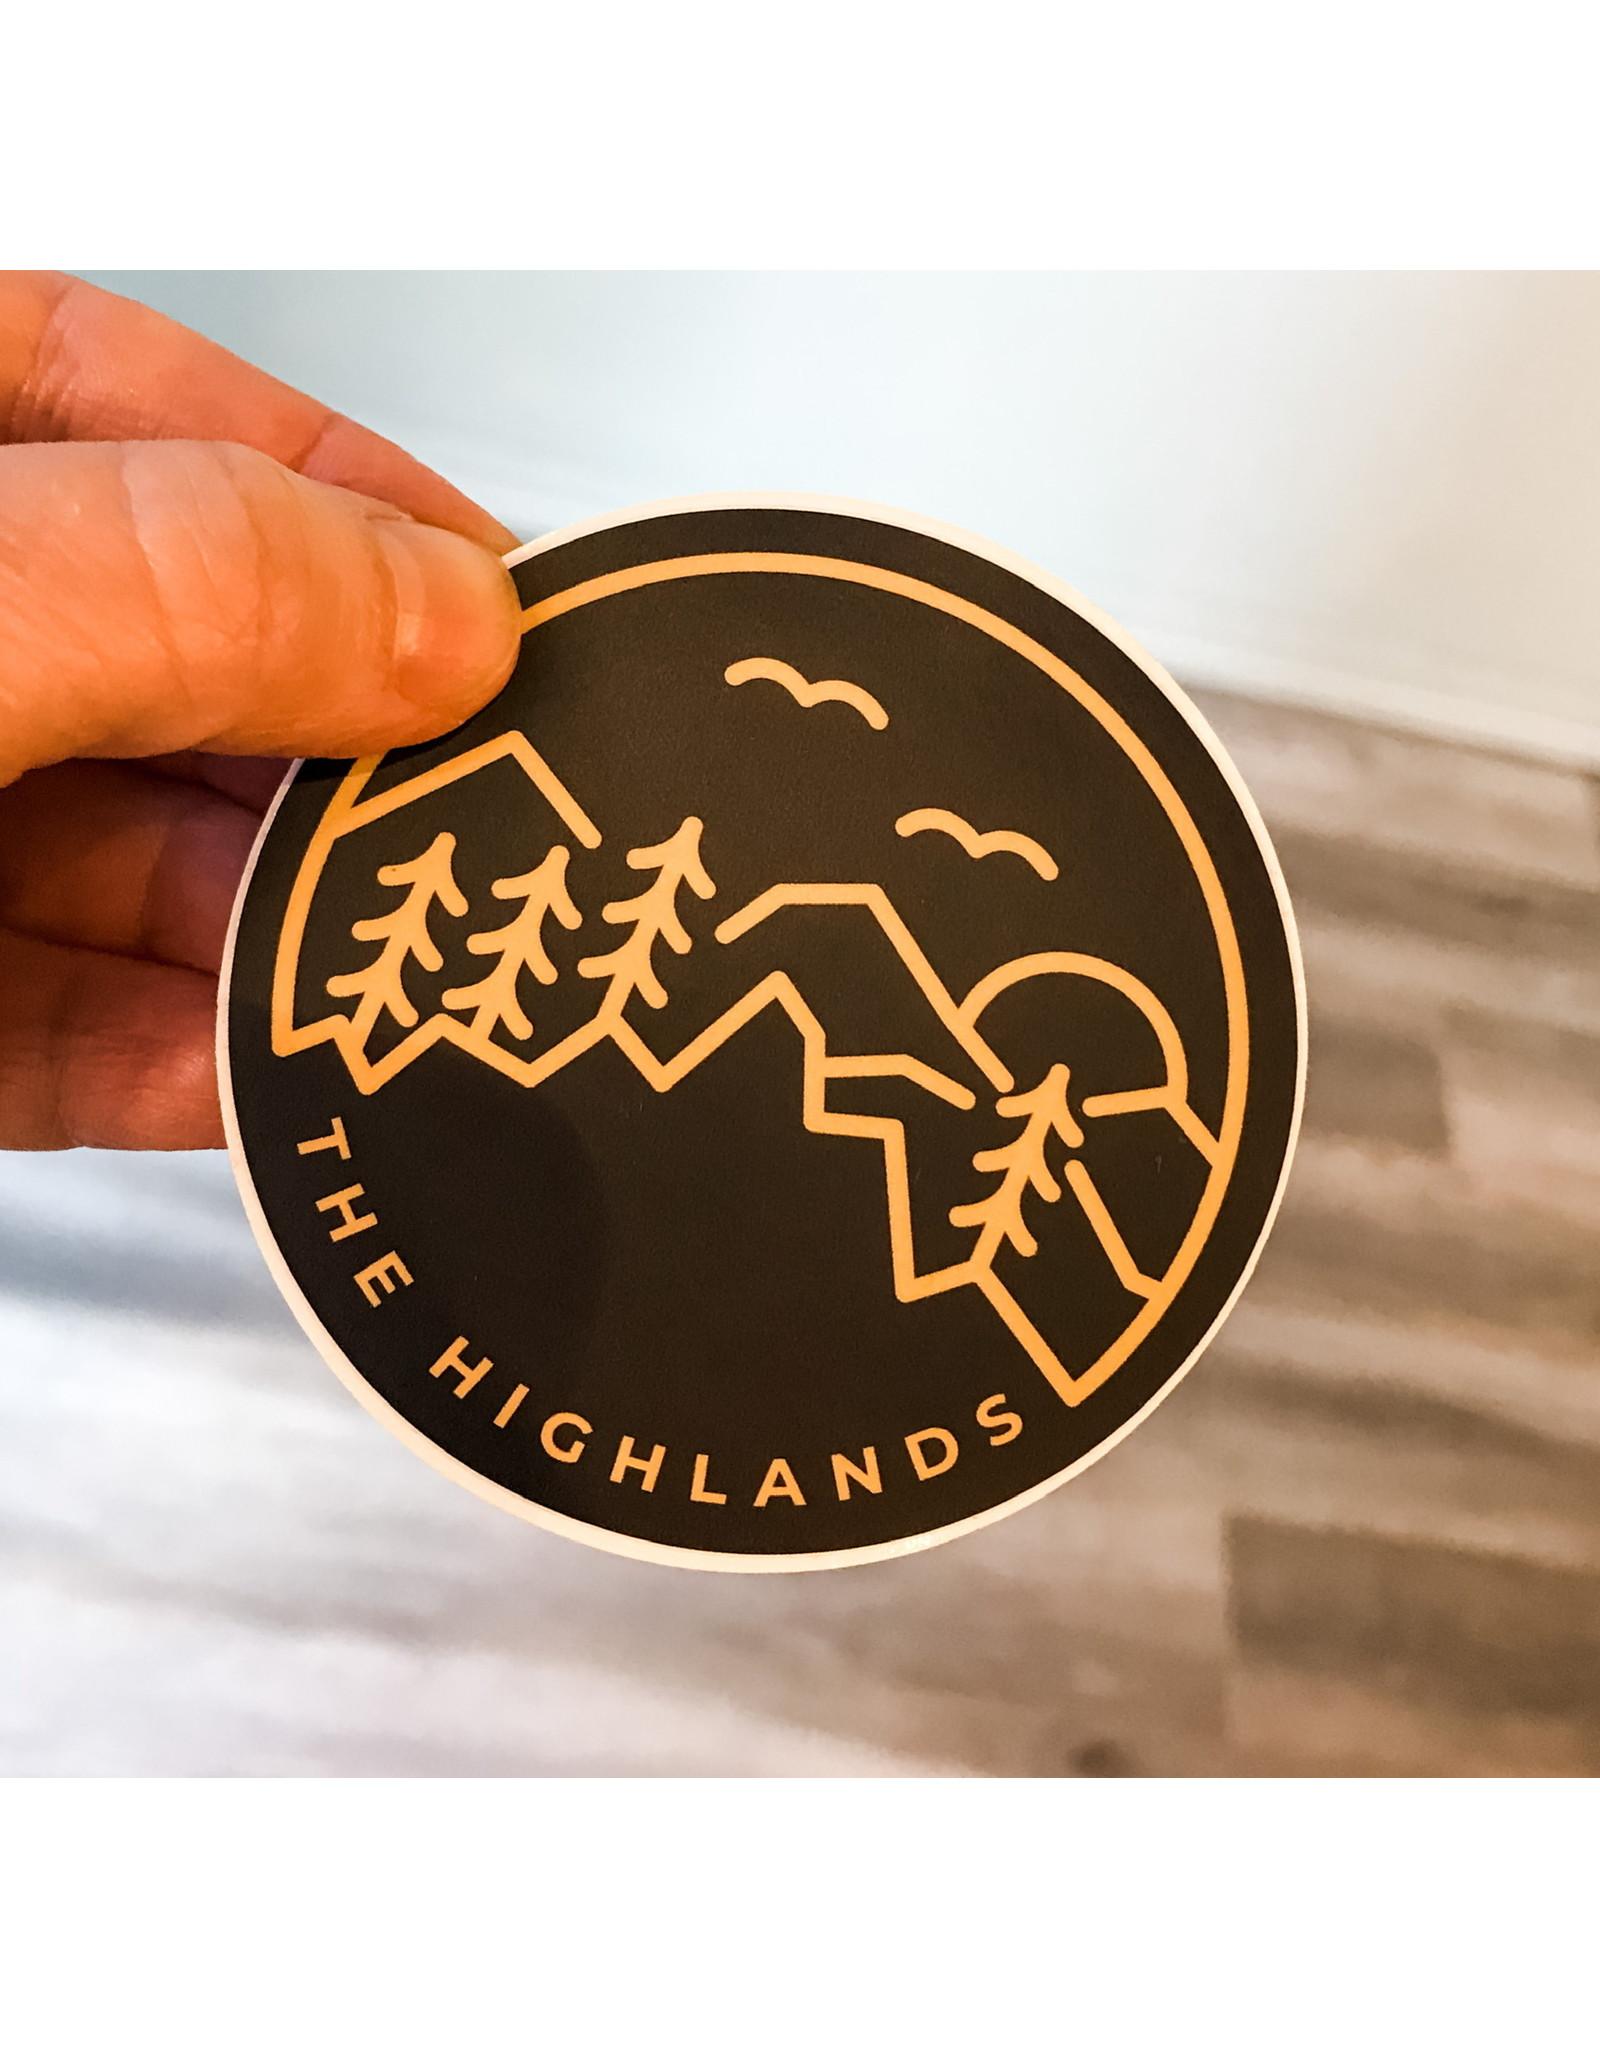 SST - Highlands Sticker